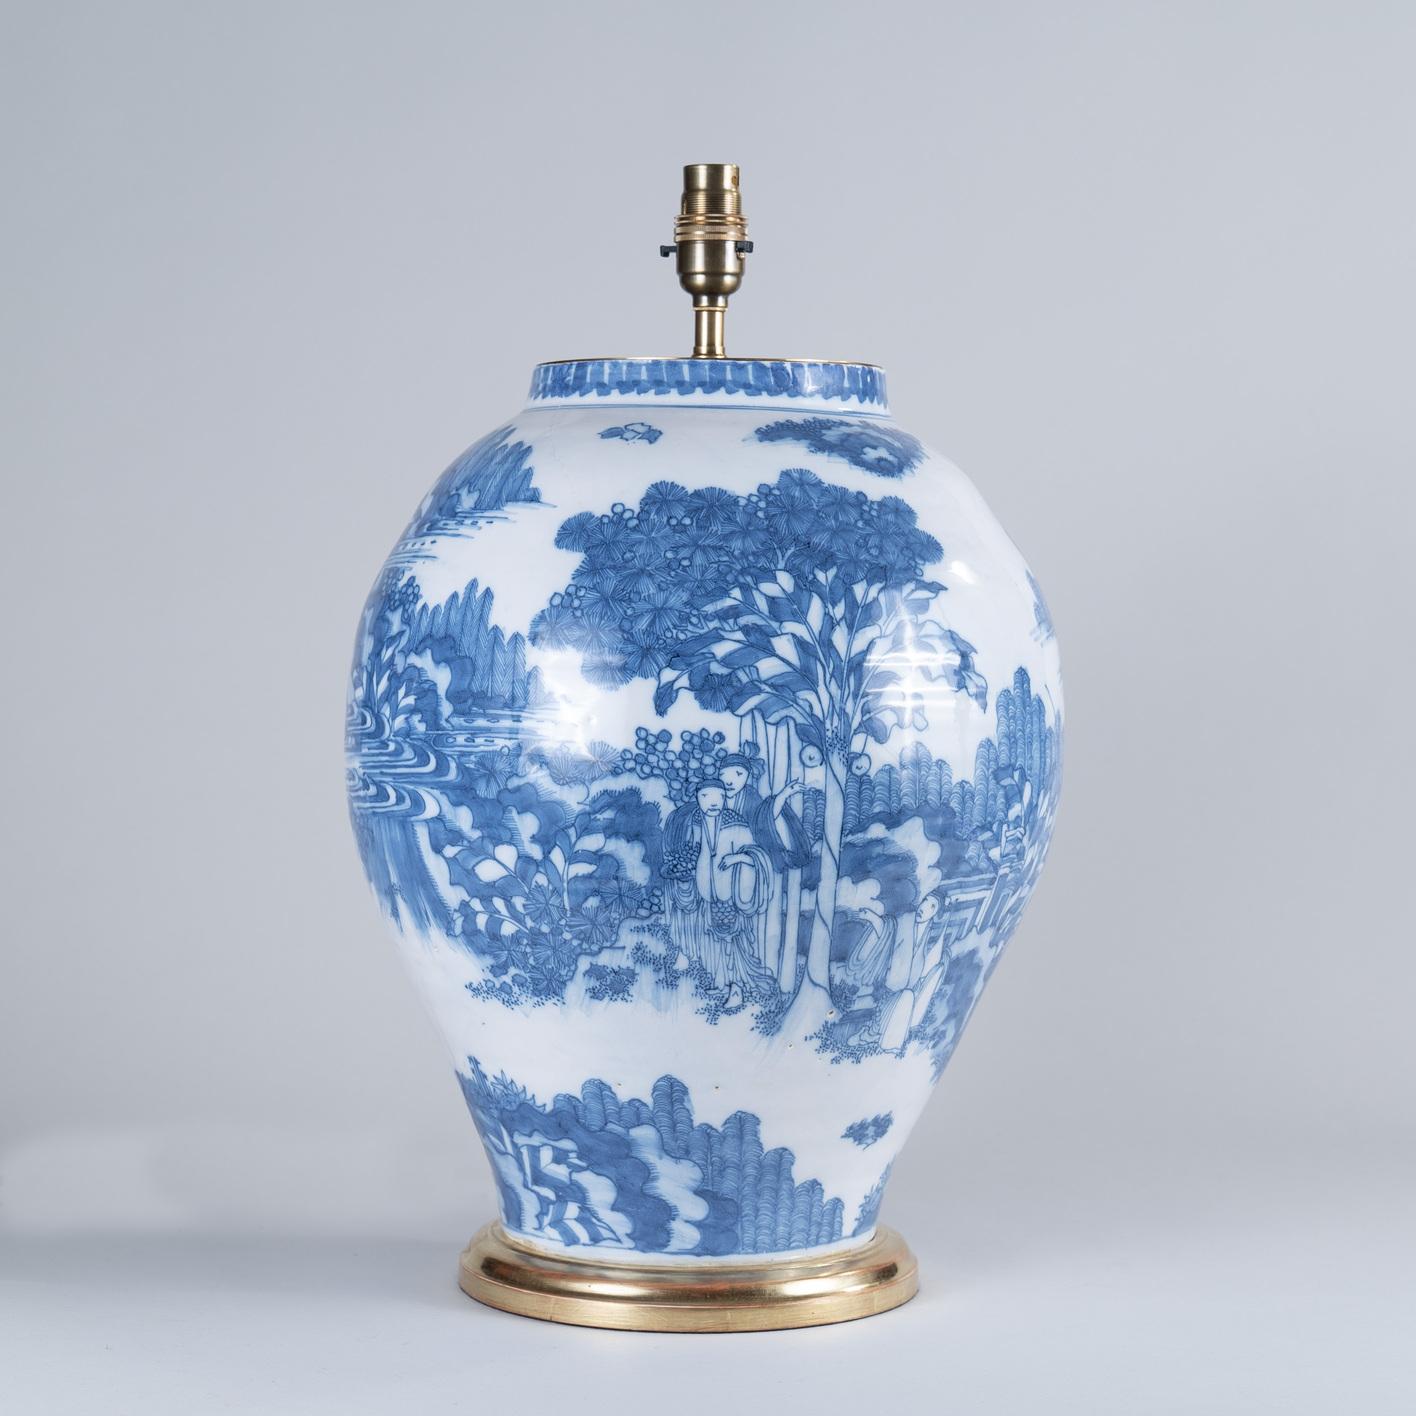 Large 17th Century Dutch Delft Vase as a Lamp